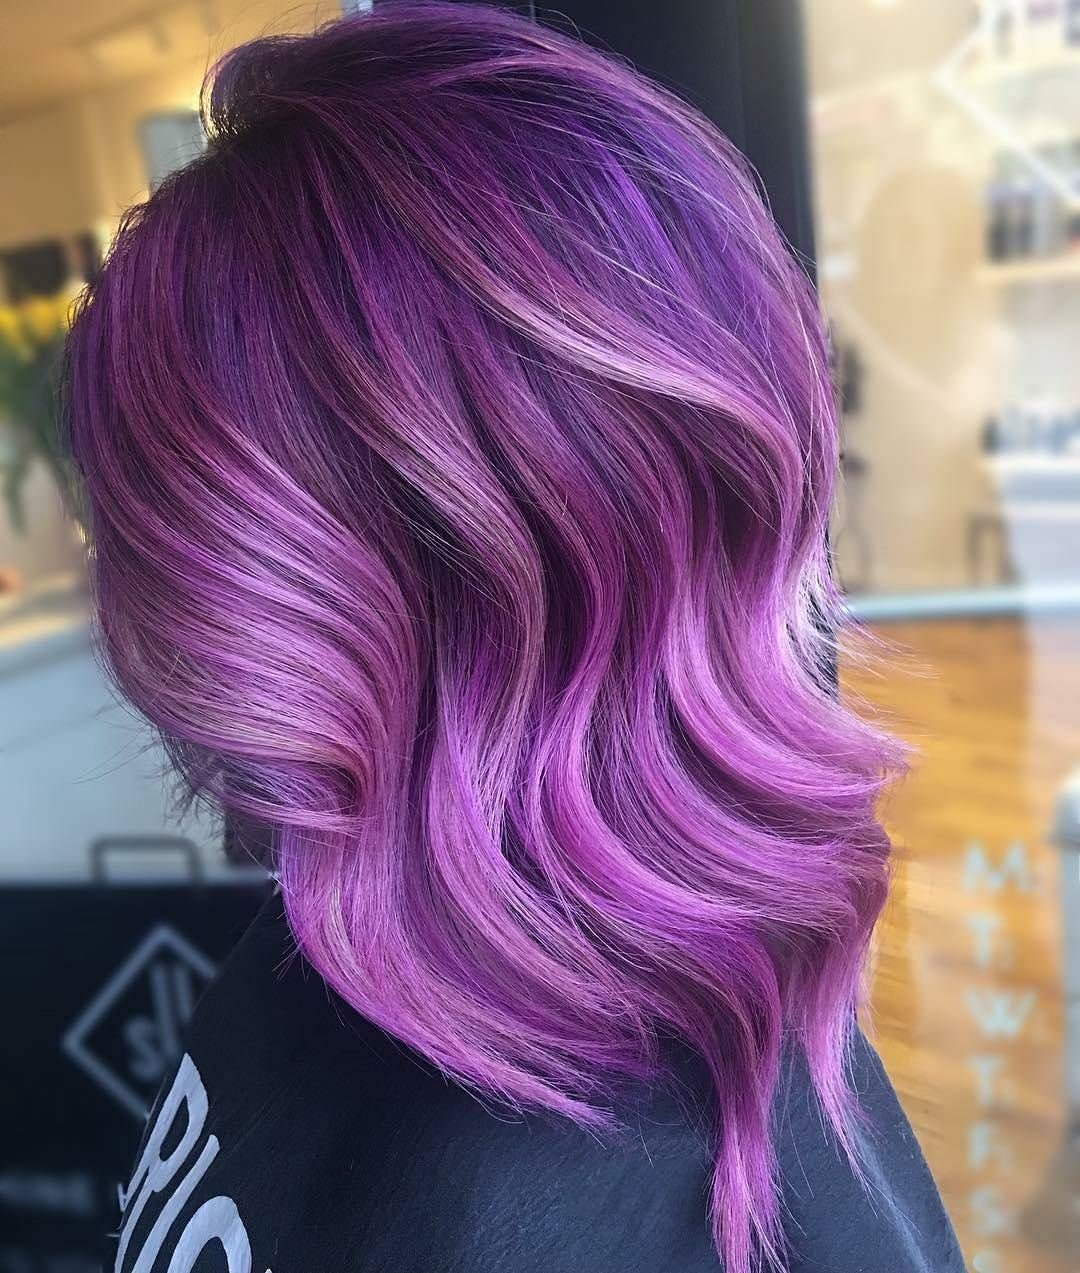 Pin By Aimy T On Har Faded Purple Hair Hair Color Purple Purple Balayage